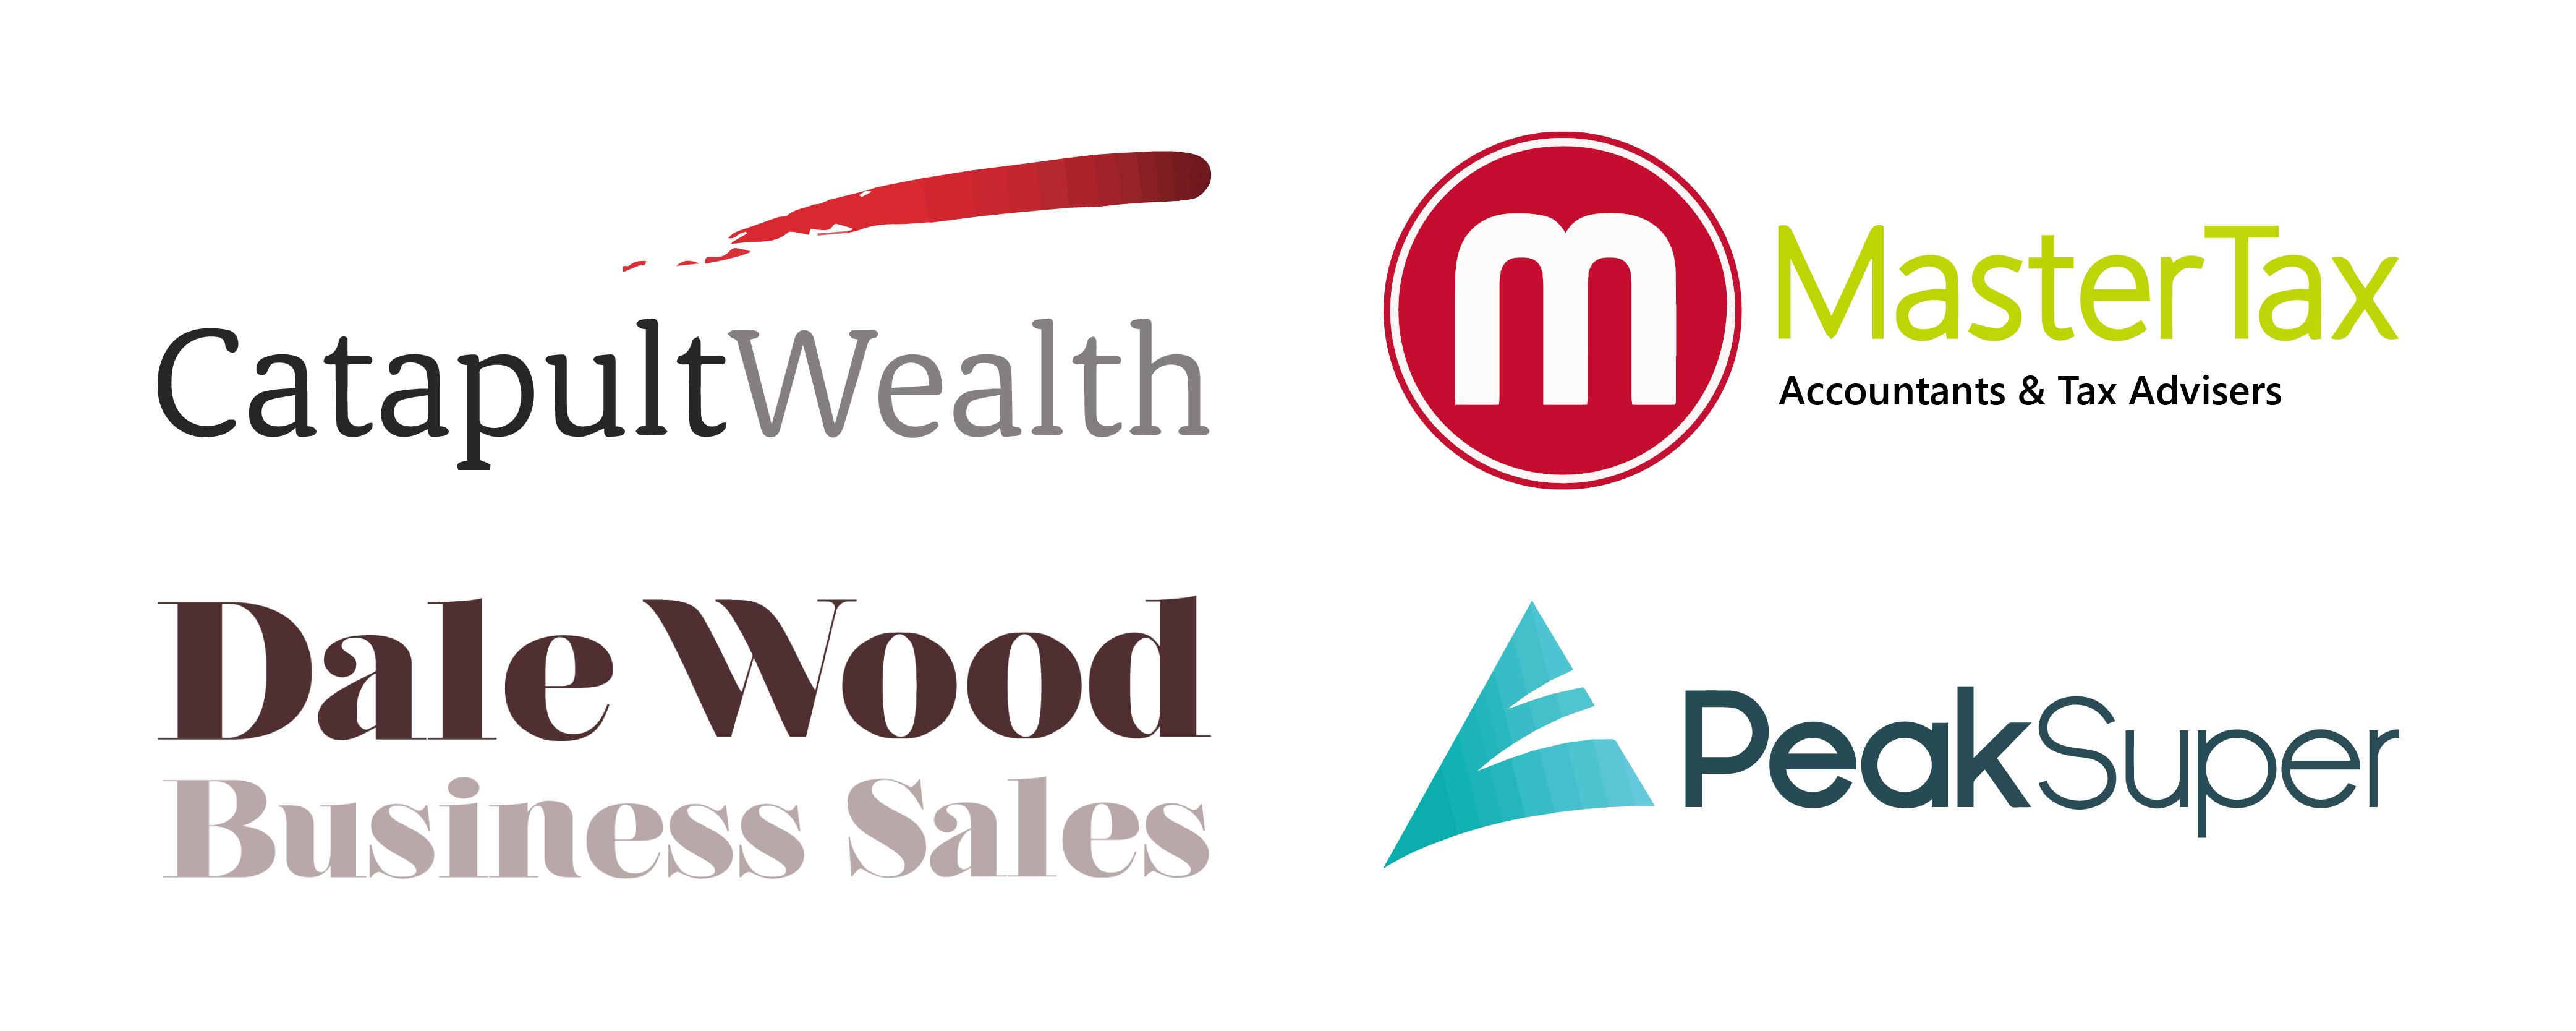 Jack Daly 2019 event sponsors